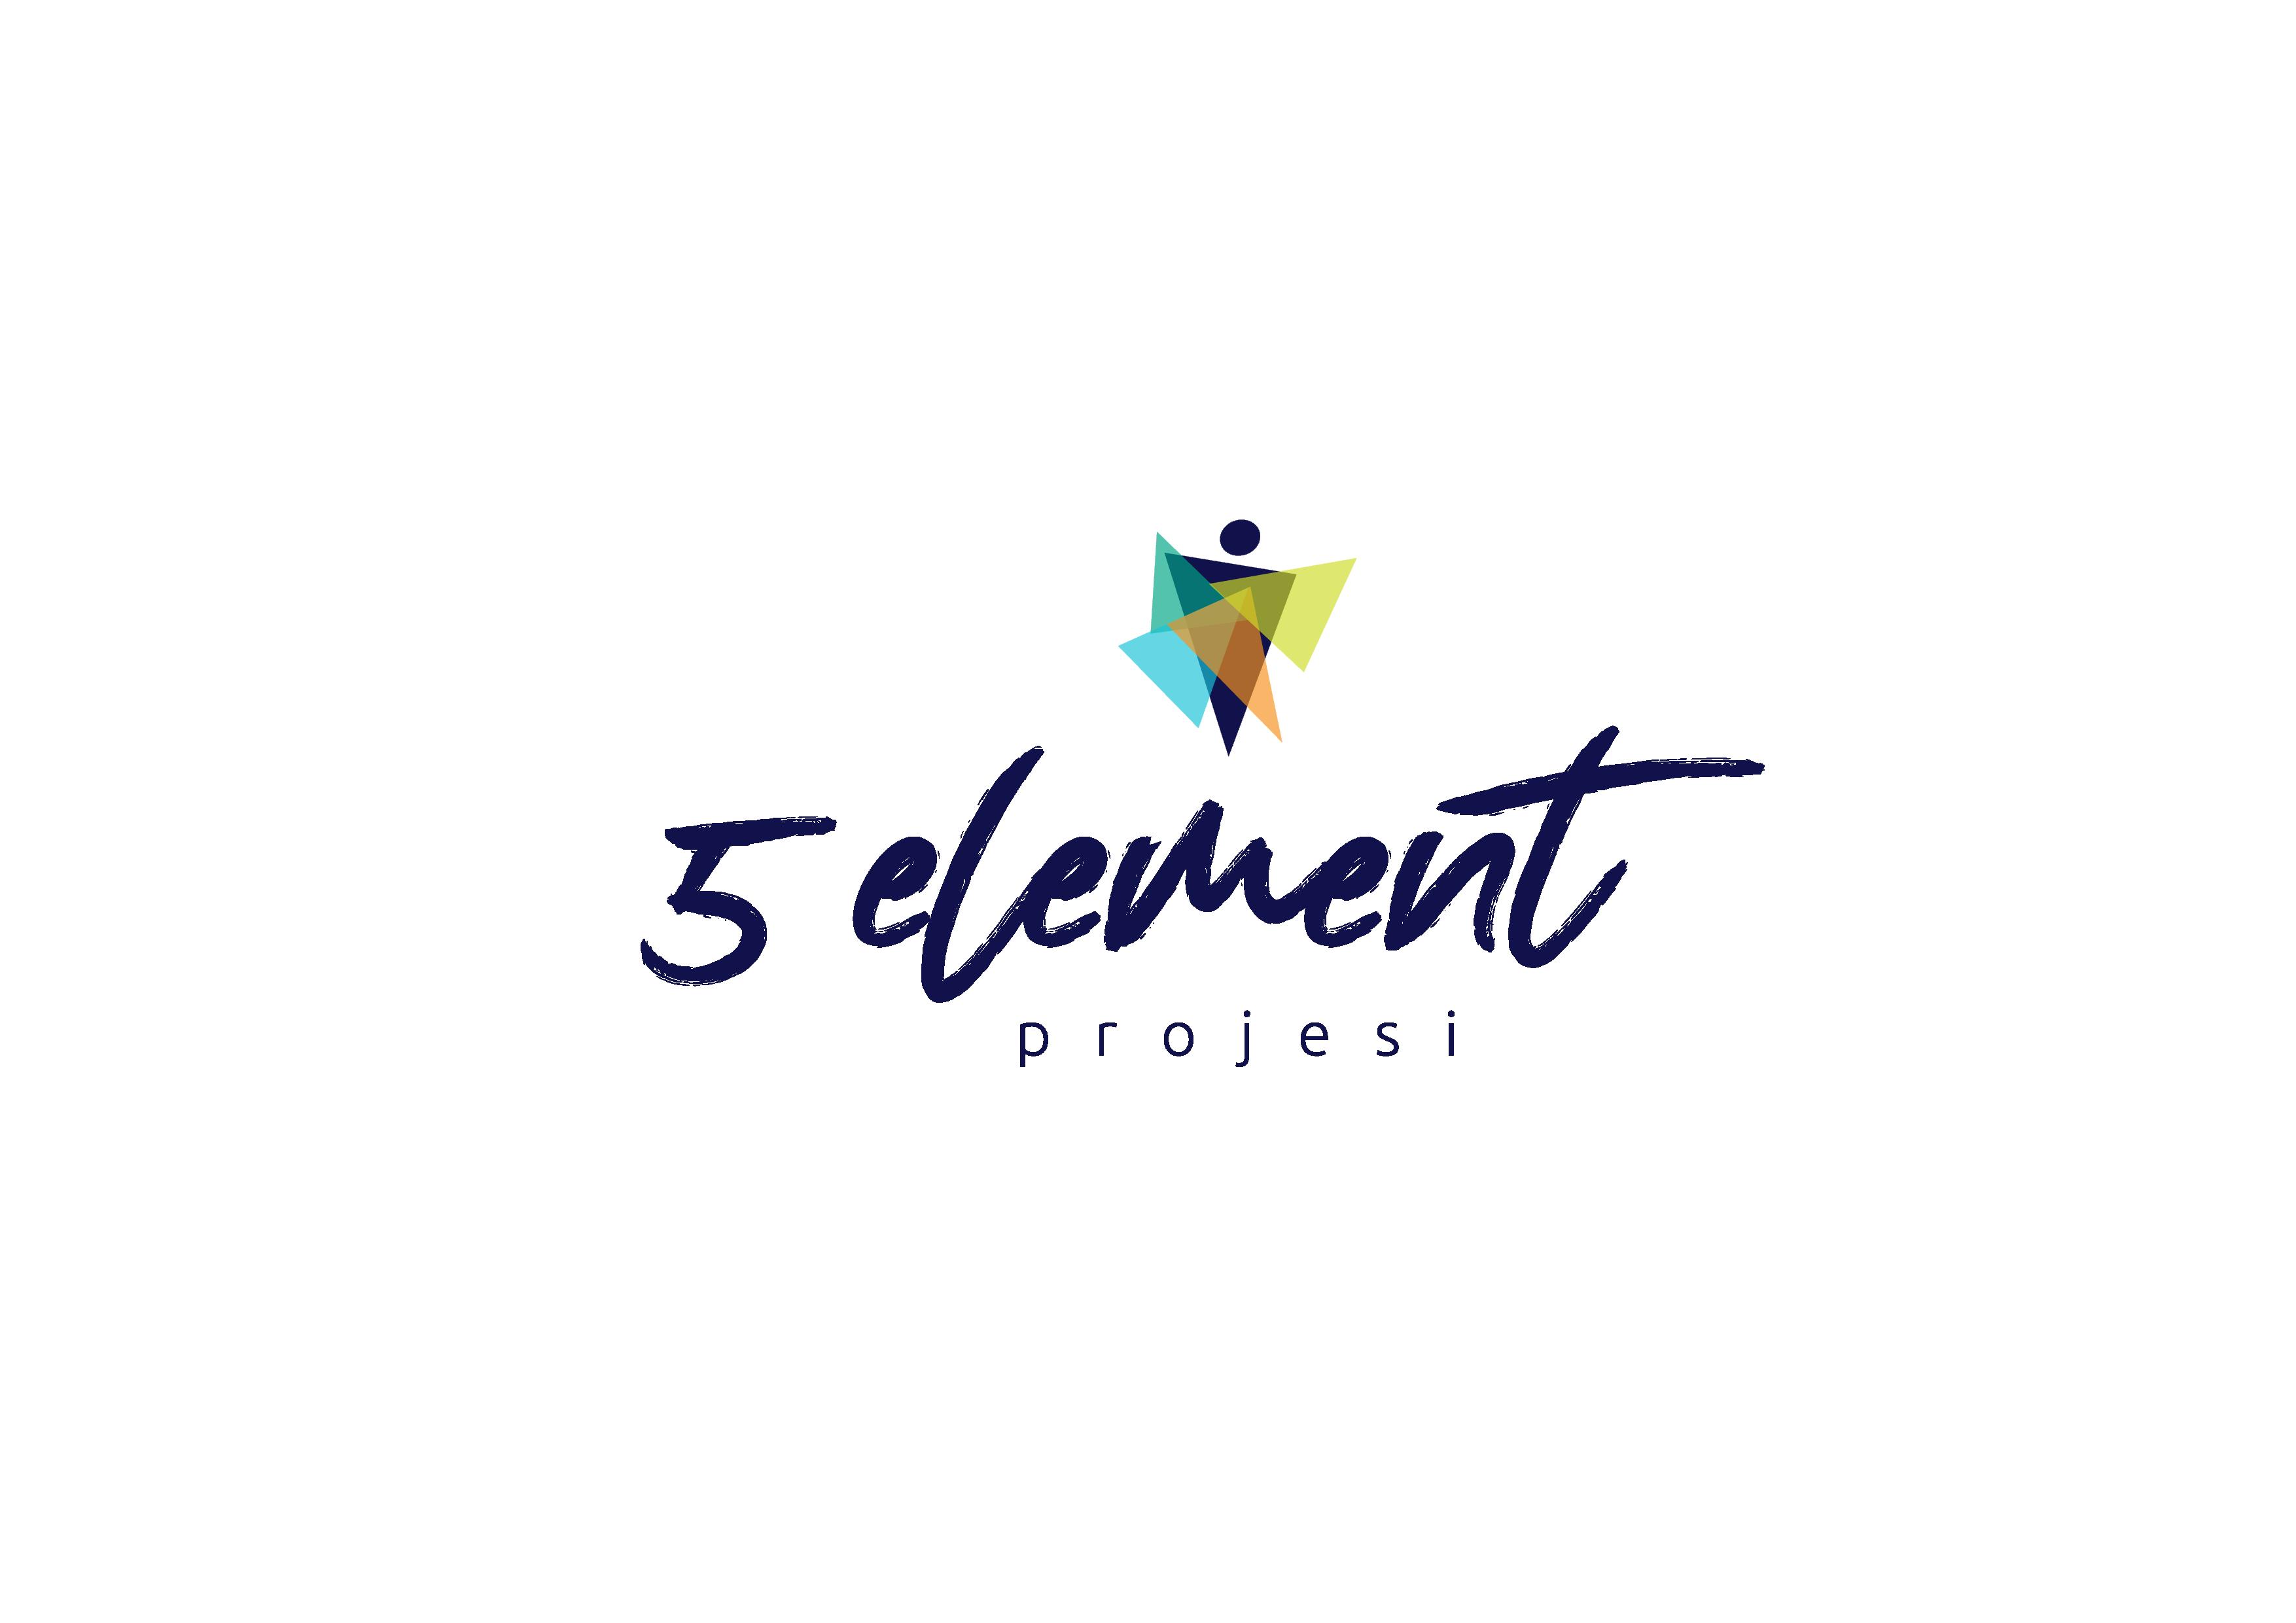 https://mindsnsolutions.com/wp-content/uploads/2021/02/Beş-Element-01.png